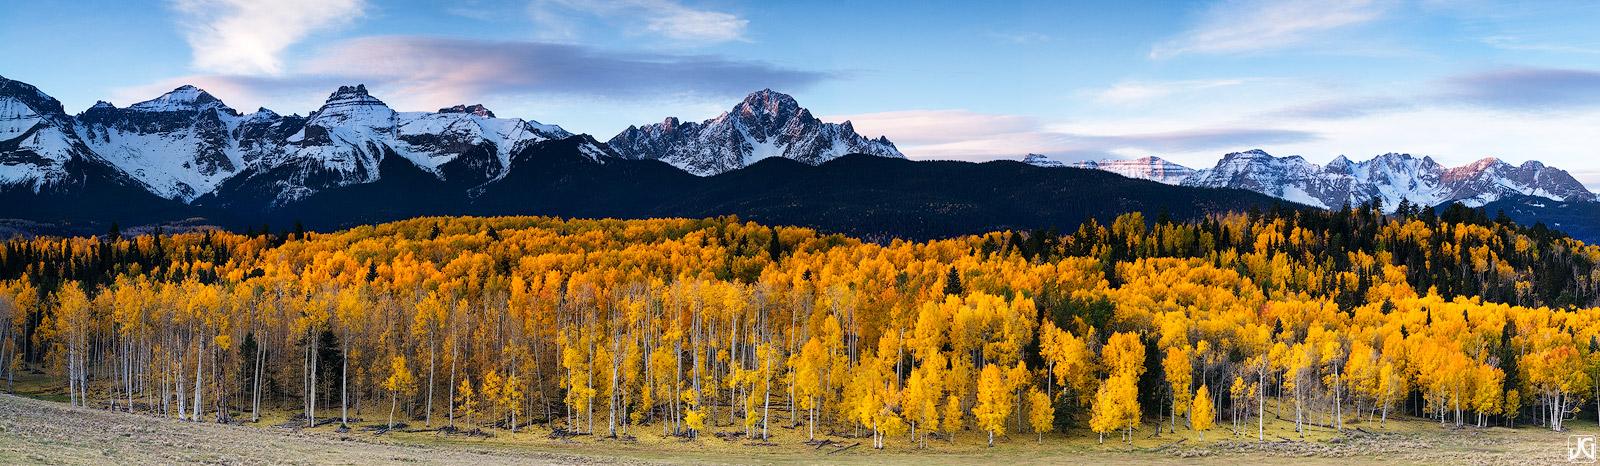 An autumn aspen forest climbs up the hillside and foothills of the Sneffels Range.